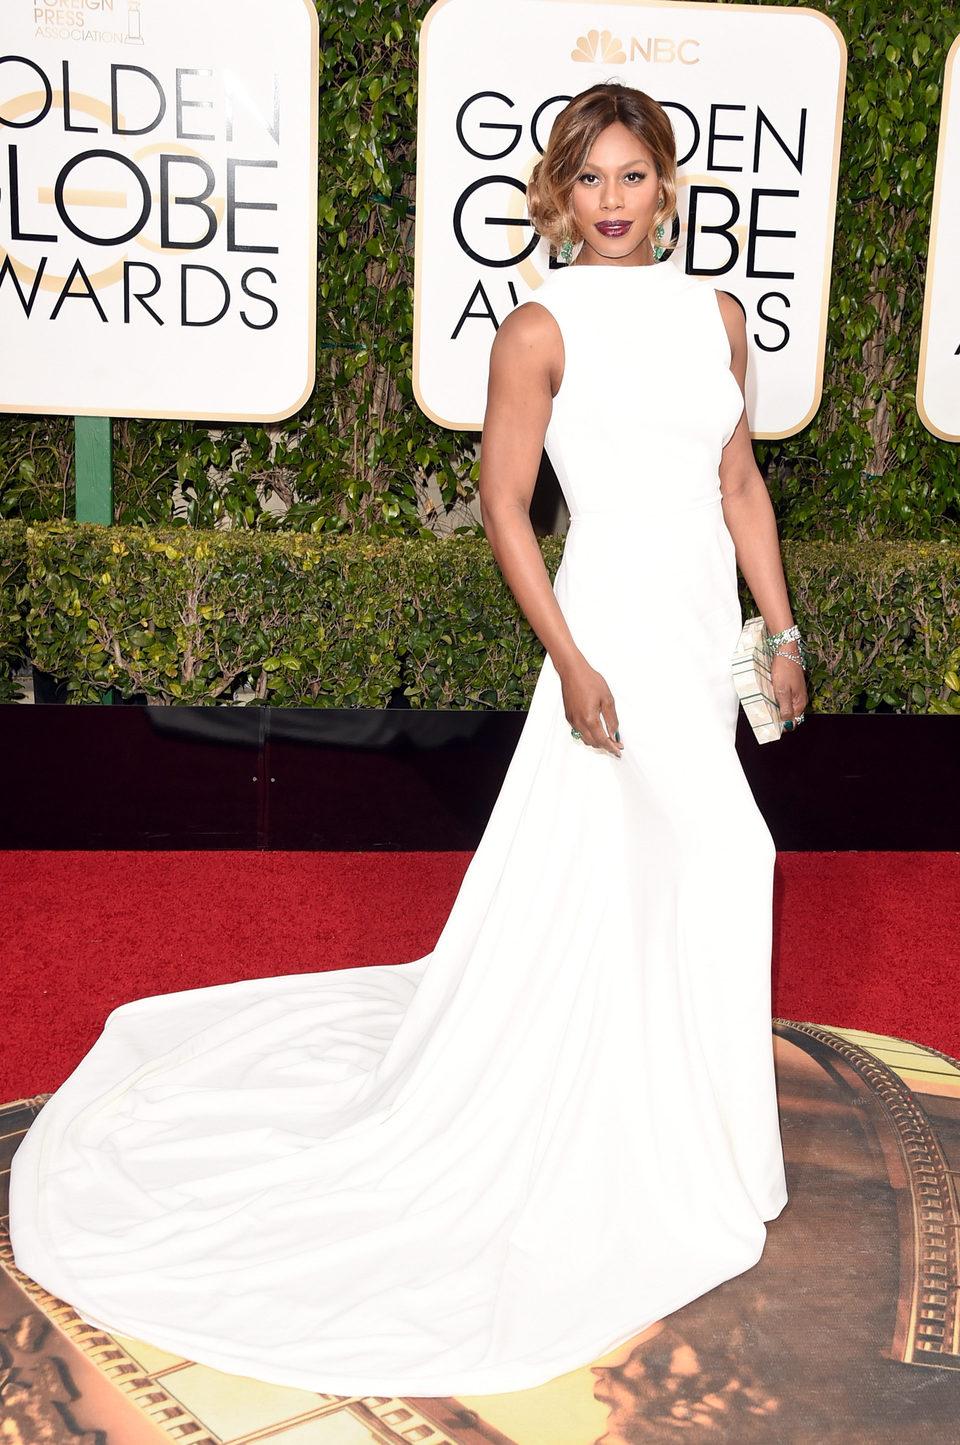 Laverne Cox at the 2016 Golden Globes red carpet